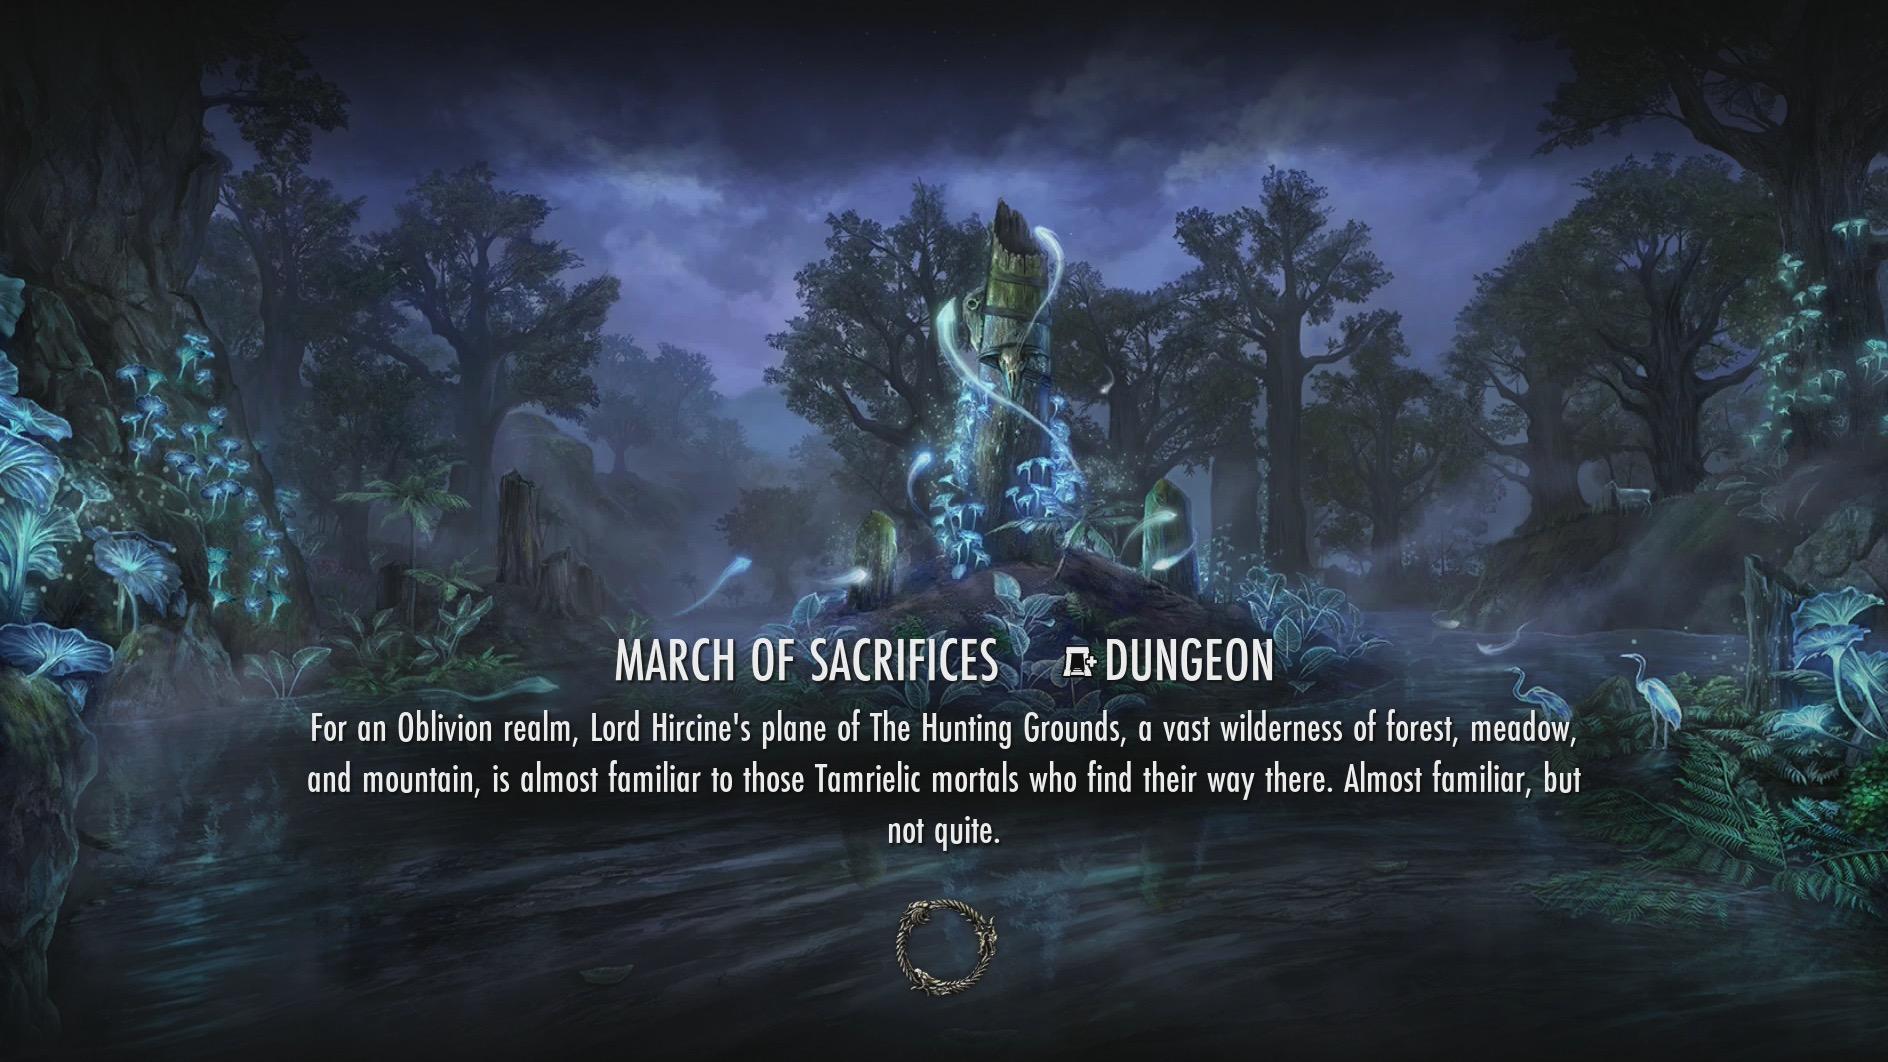 The Elder Scrolls Online Wolfhunter - March of Sacrifices